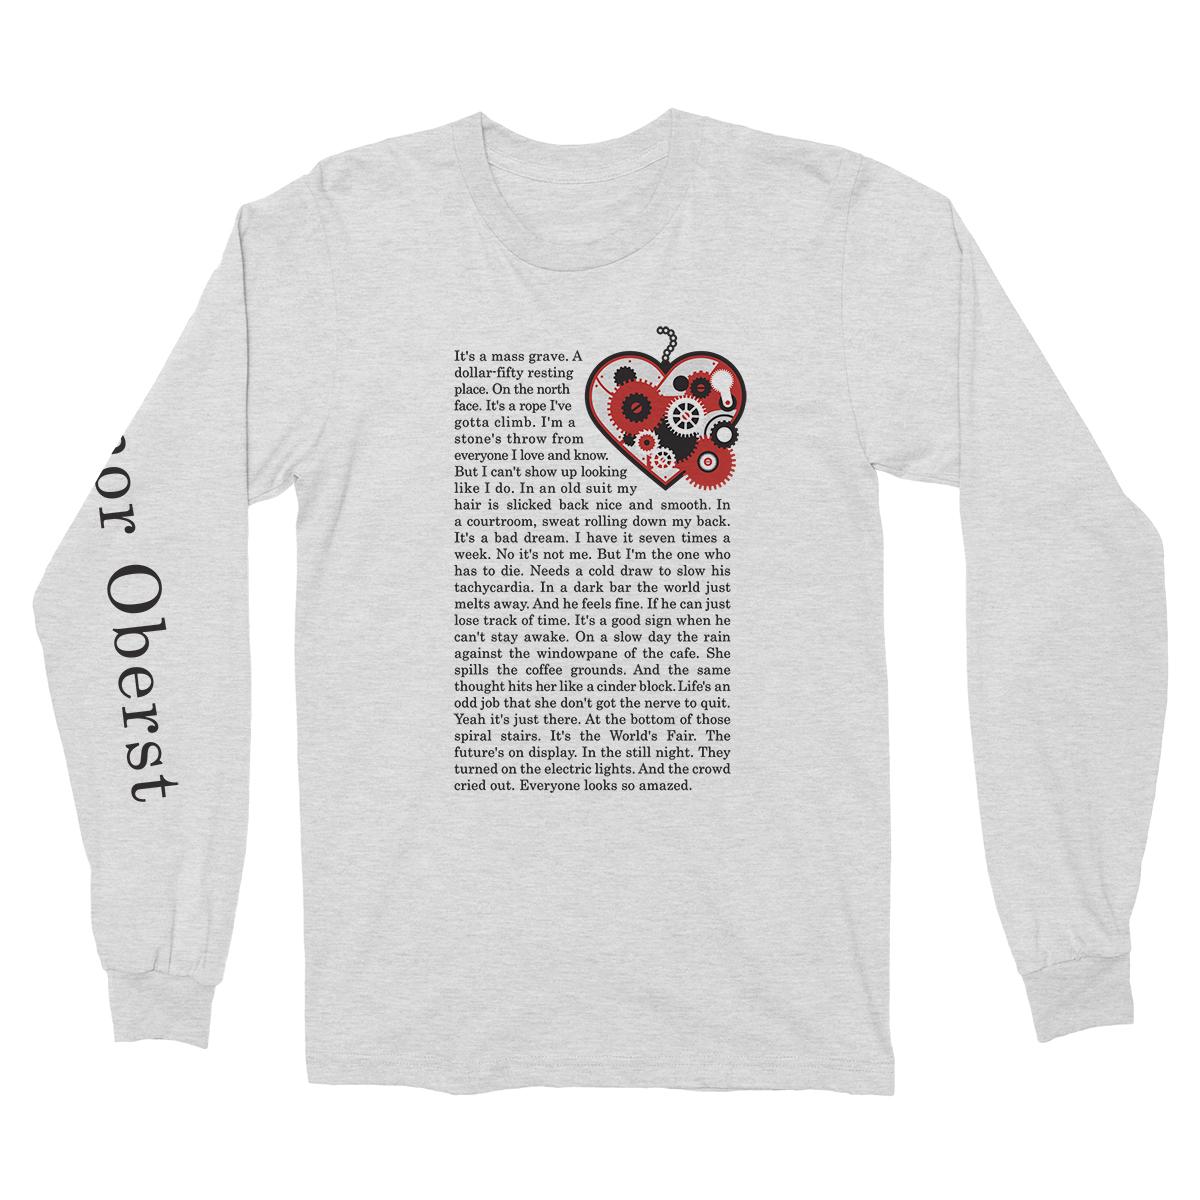 Tachycardia - Long Sleeve Tee - Conor Oberst